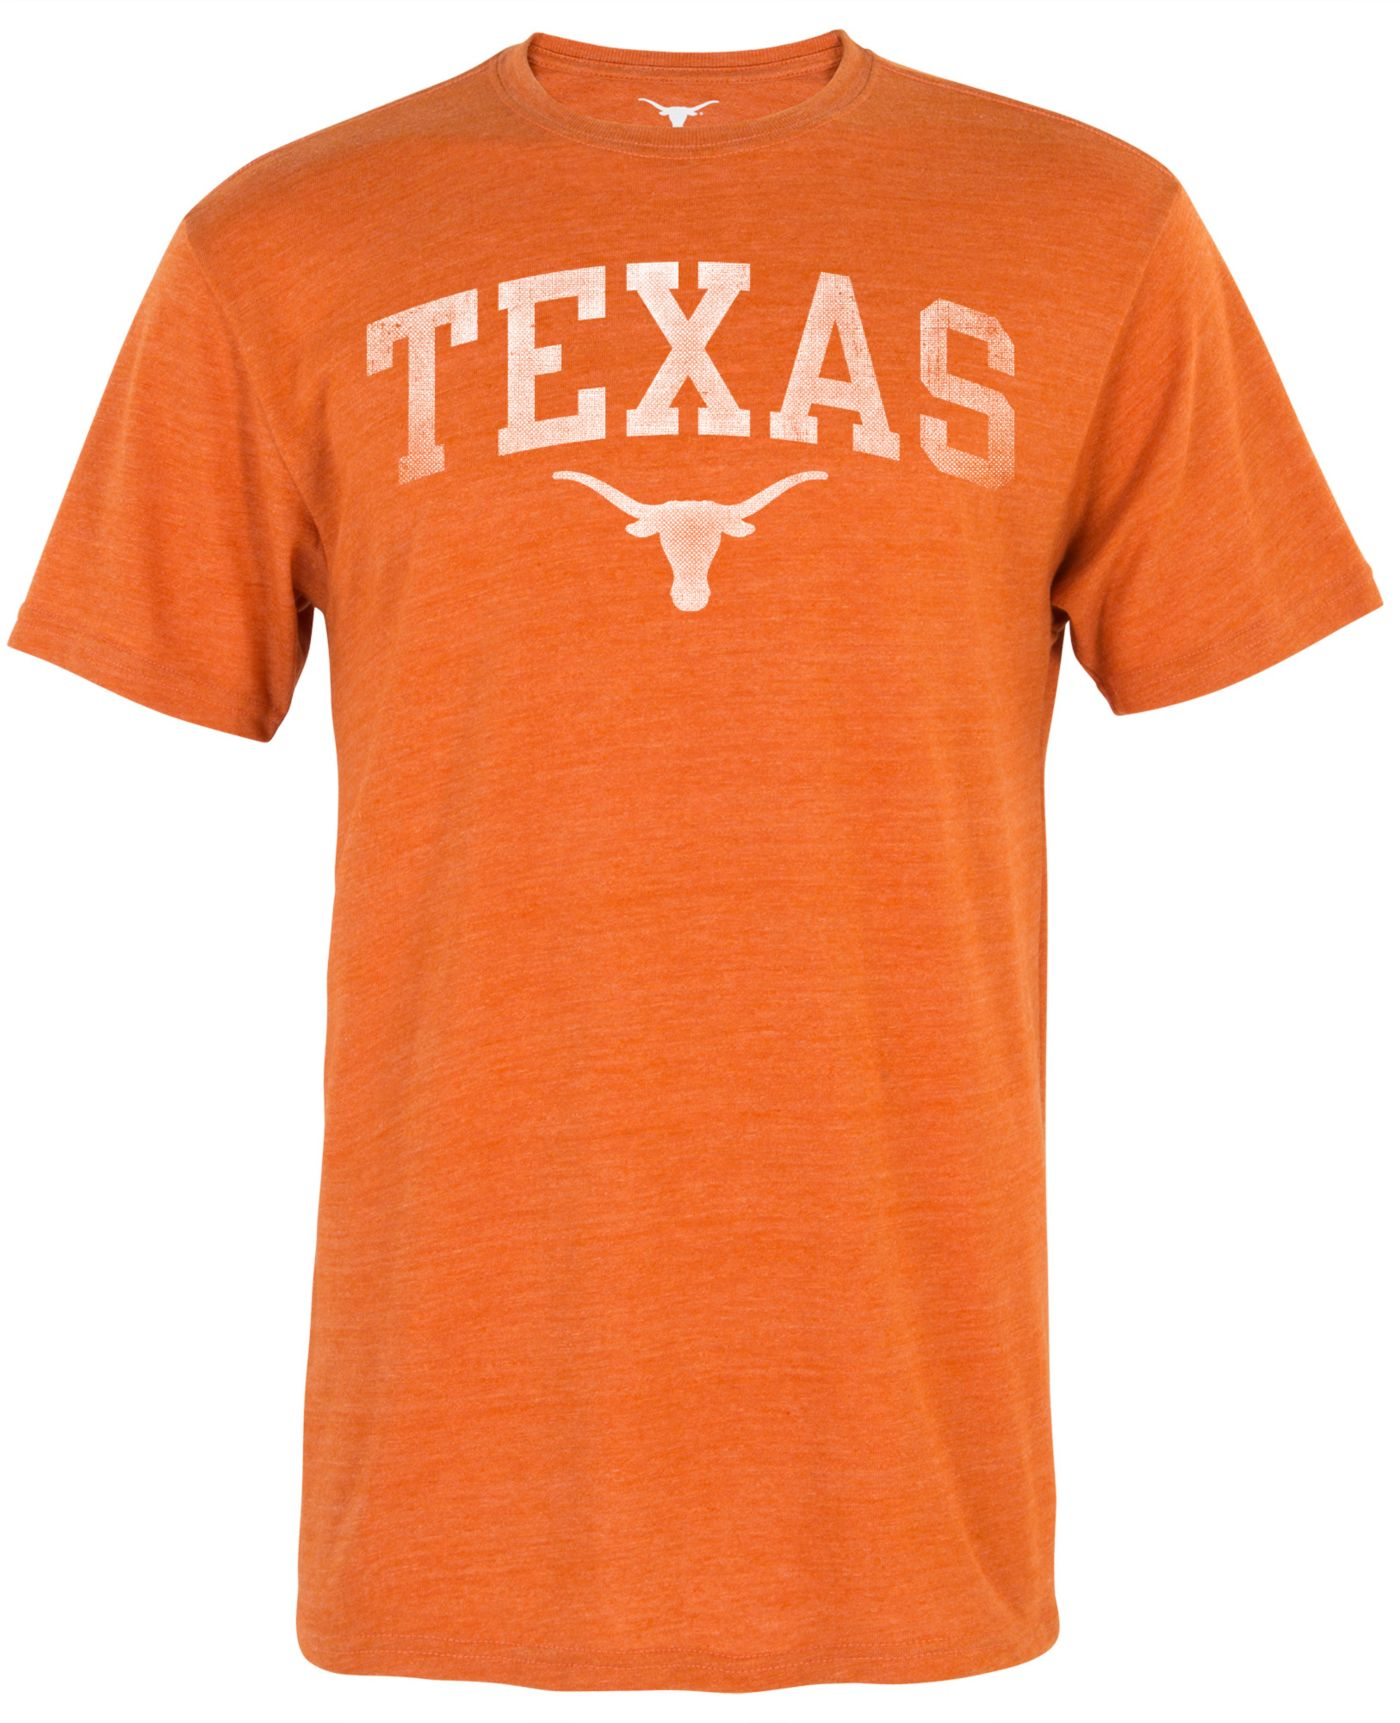 University of Texas Authentic Apparel Men's Texas Longhorns Burnt Orange Arch Tri-Blend T-Shirt